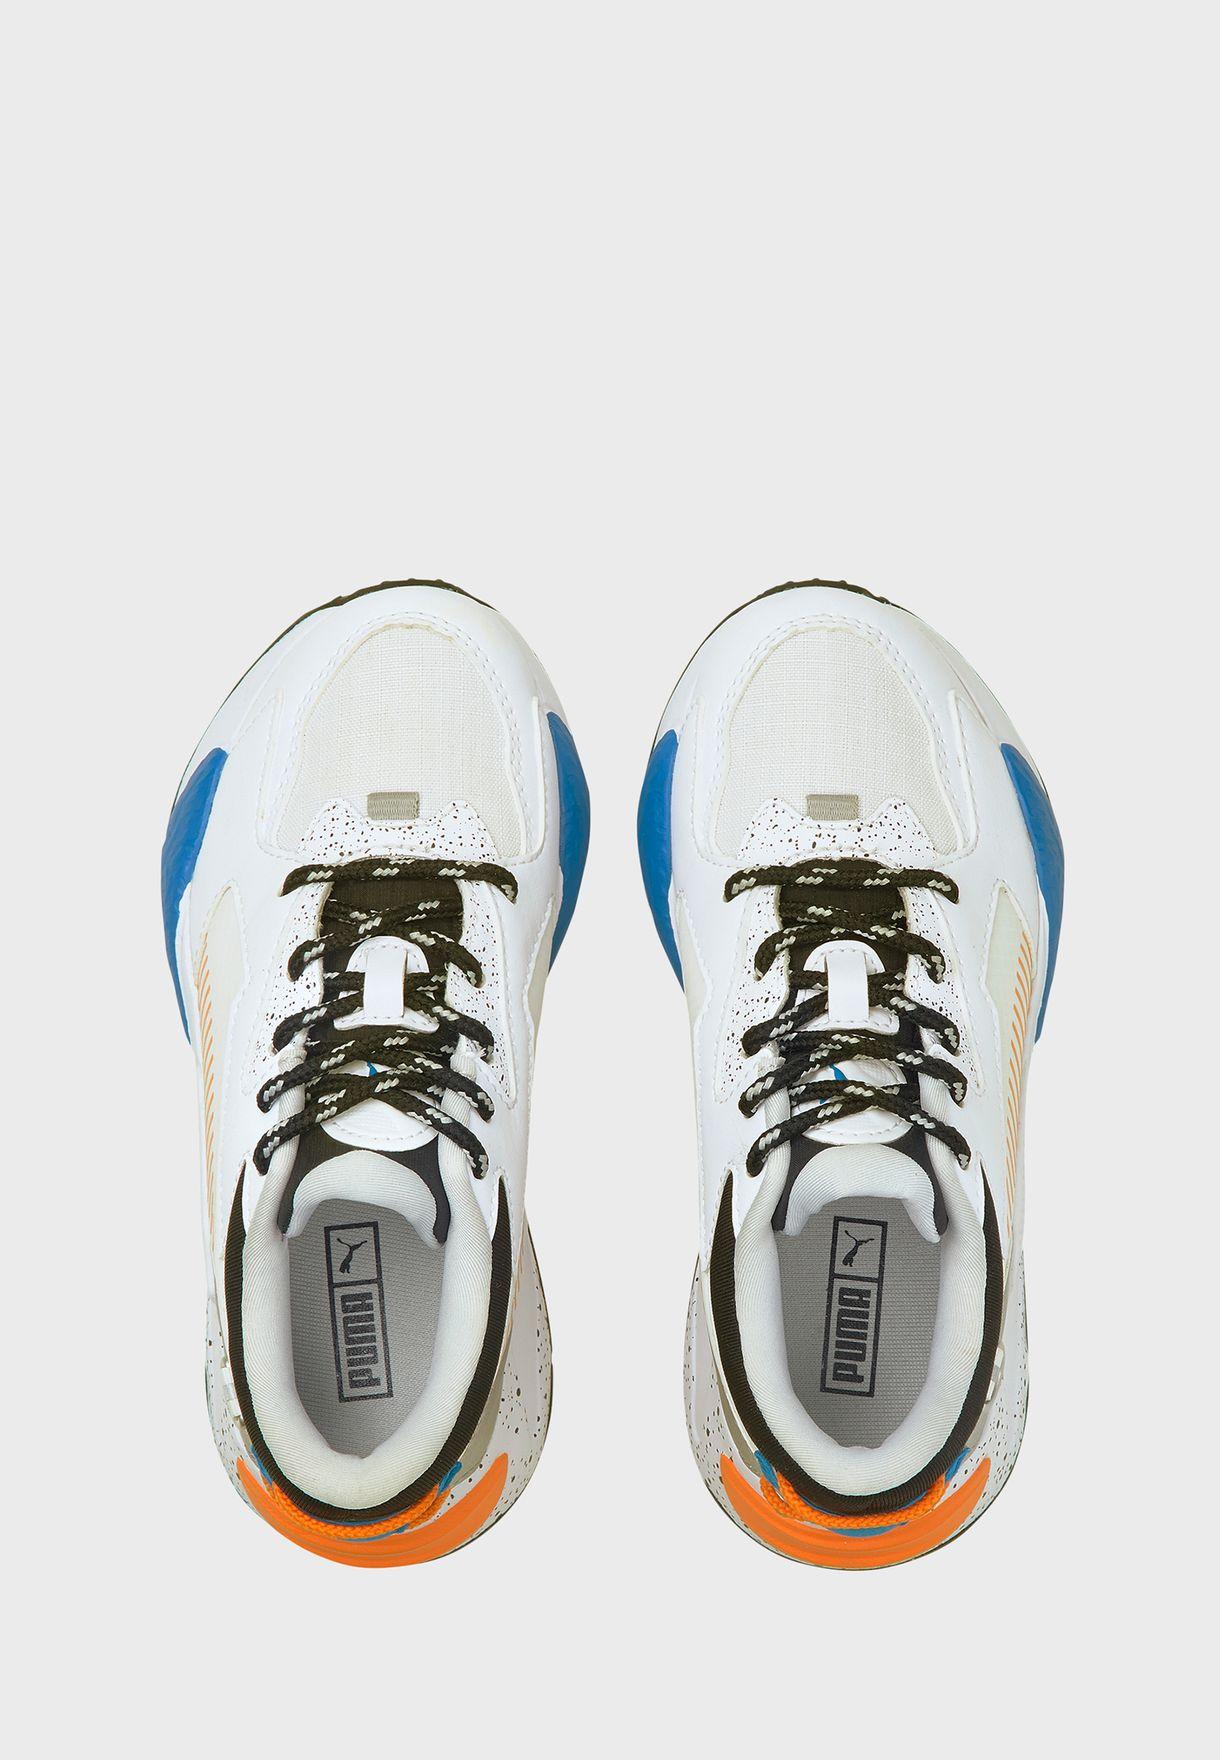 حذاء ار اس-زد استرونوتس